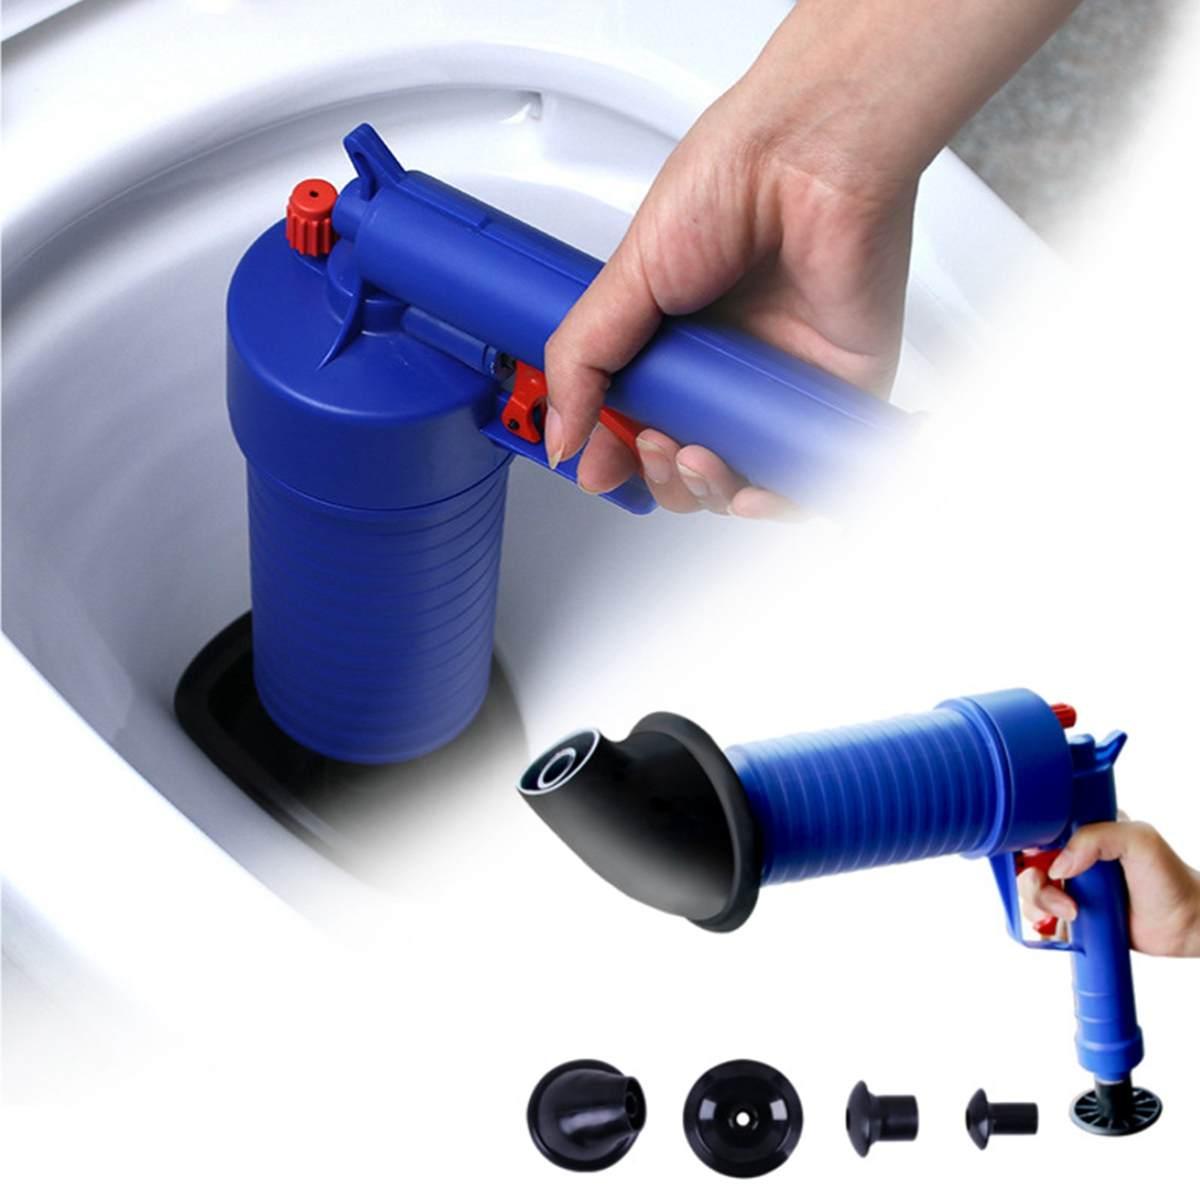 Sink Plunger Drain Unblocker Air Pump Drains Shower Pipe Unblock Clog Remover II